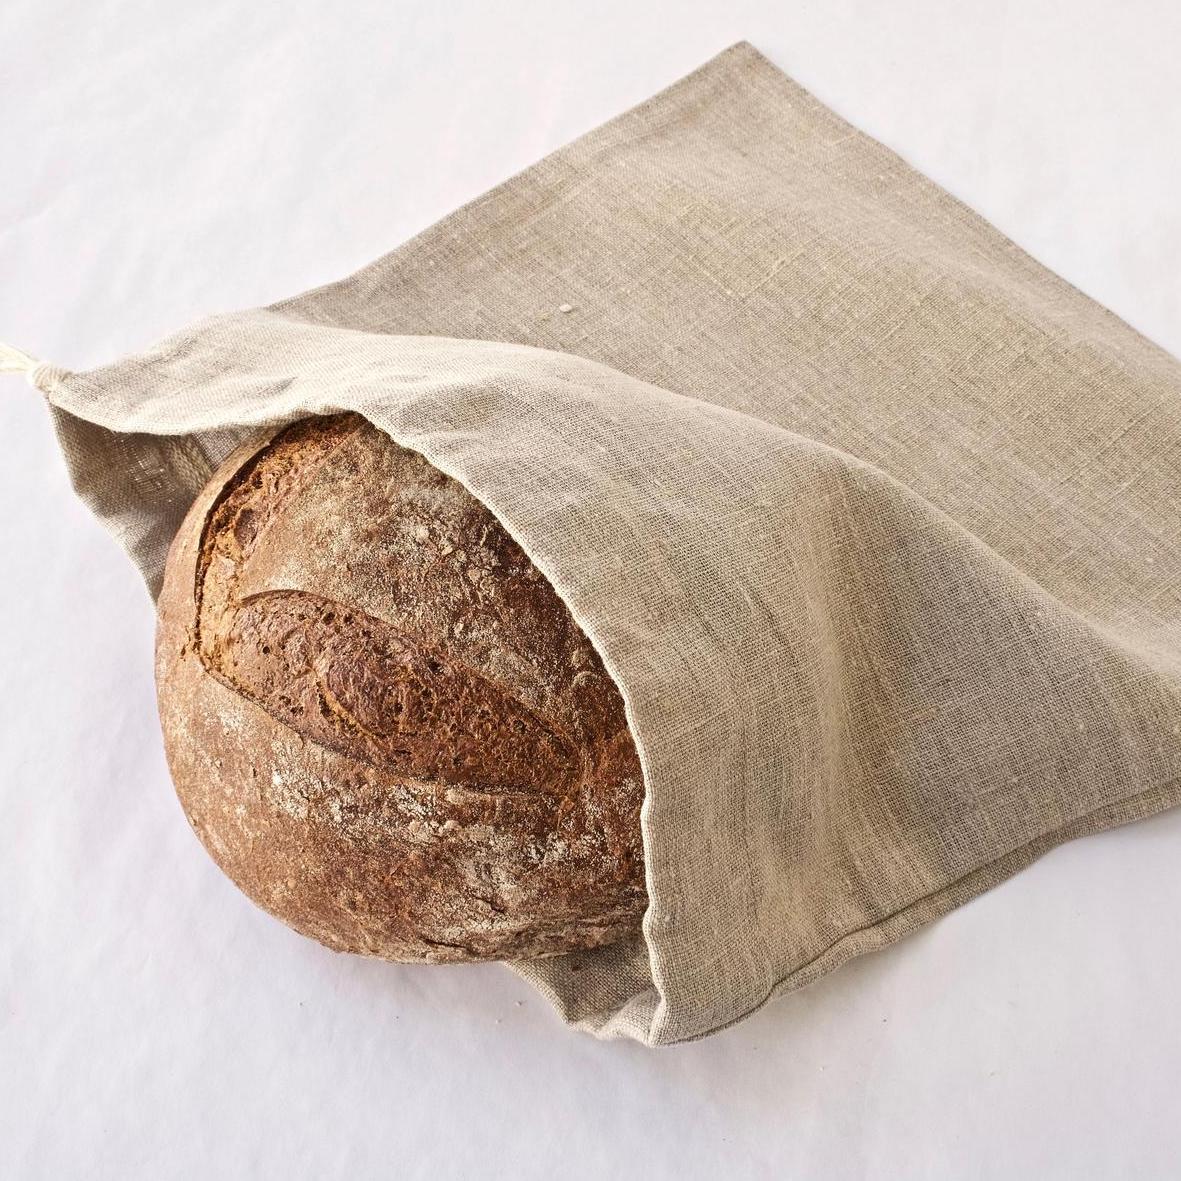 linen bread bag with a boule inside